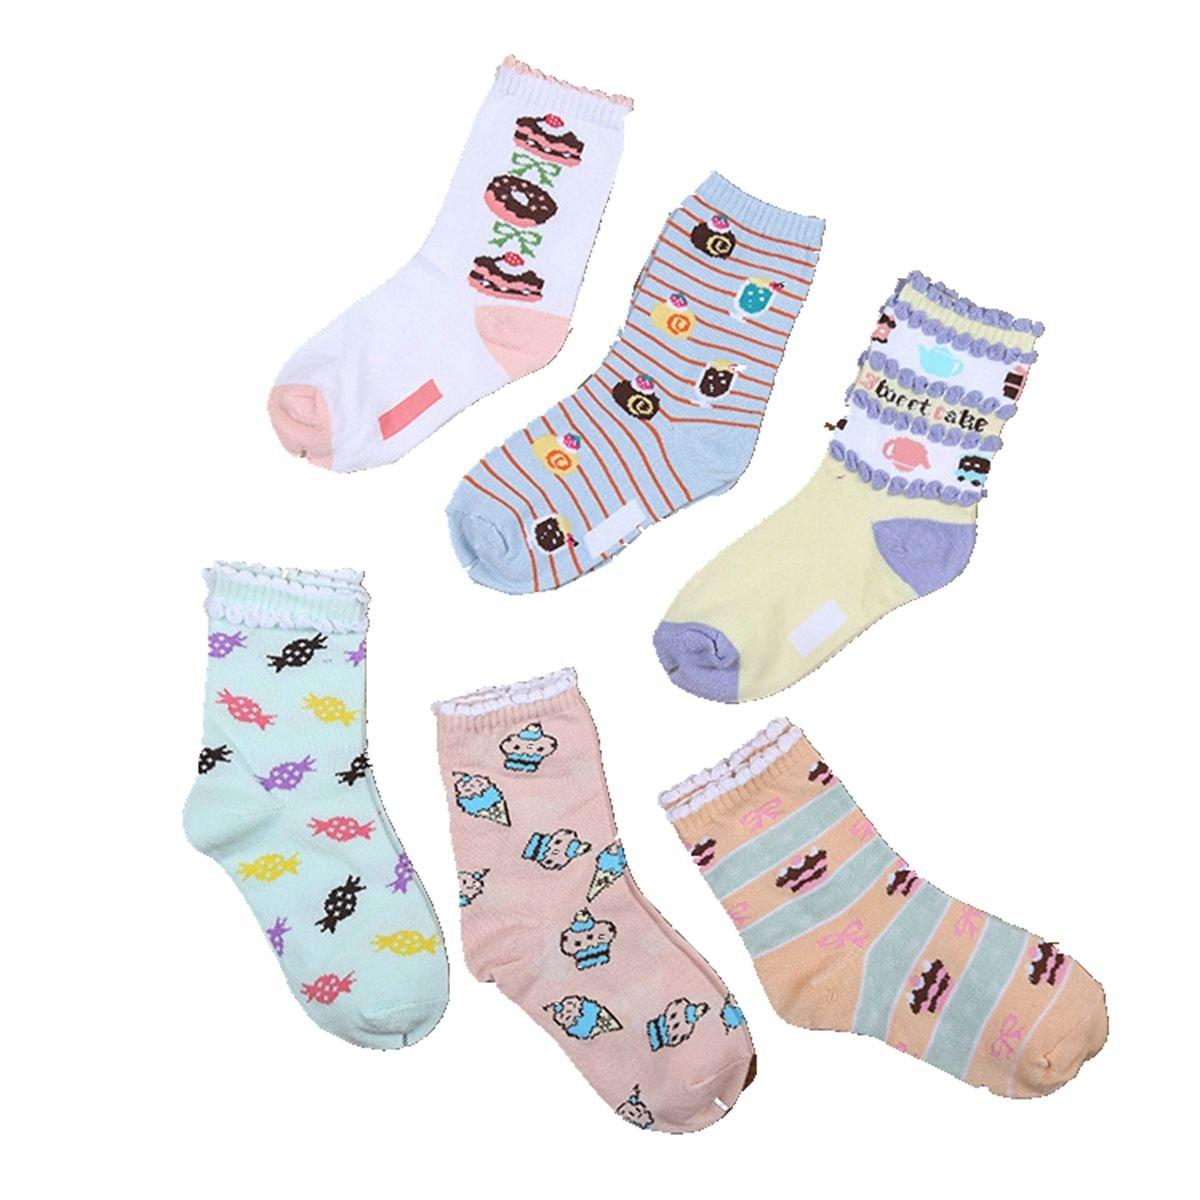 Girls Short Socks Fashion Ice Cream Cotton Basic Crew Kids Sock 10 Pair Pack